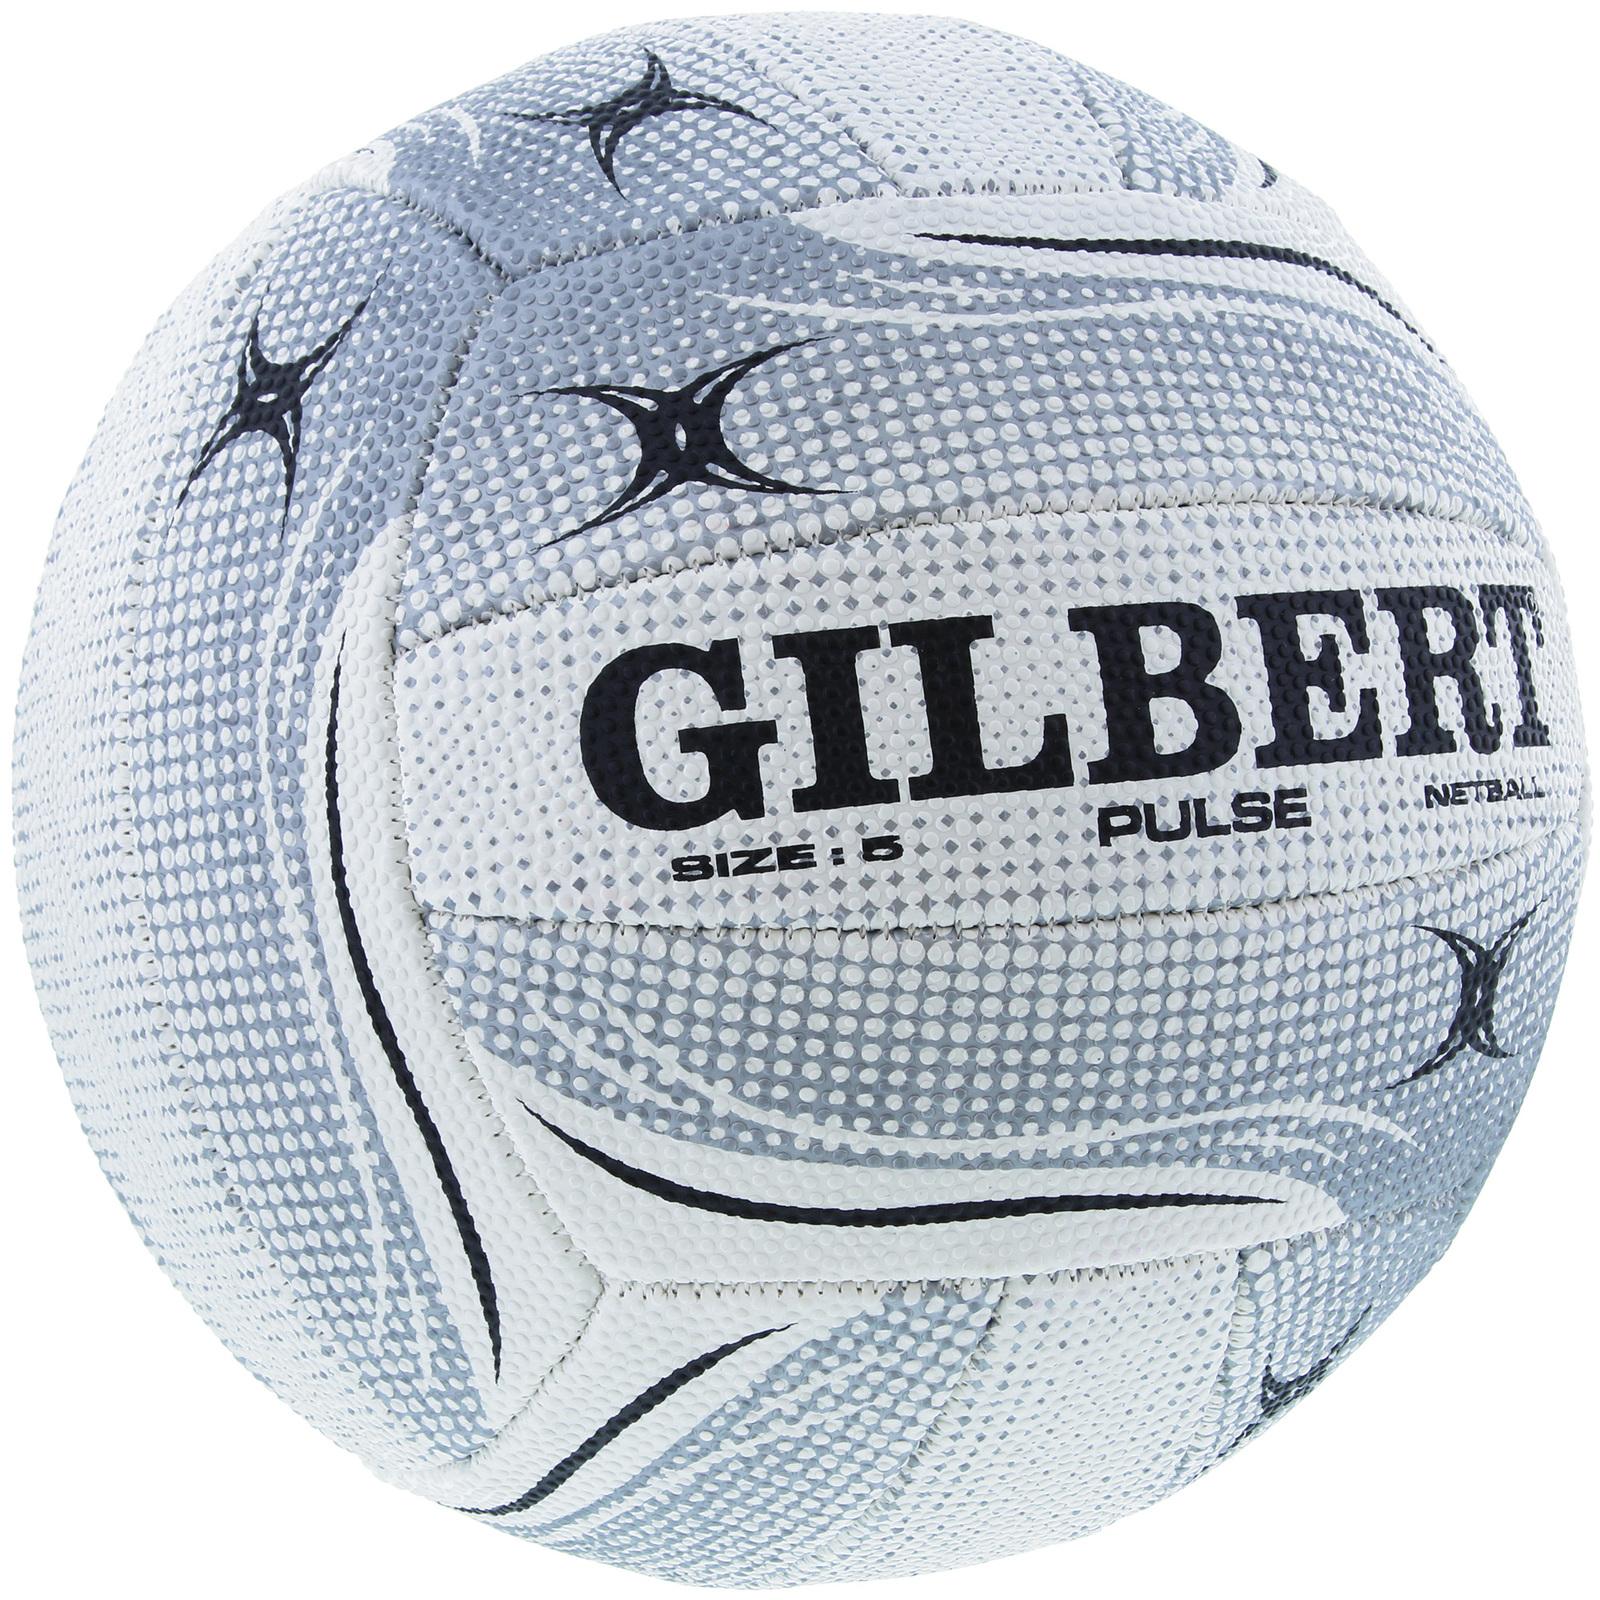 Gilbert Pulse Netball-White (Size 5) image